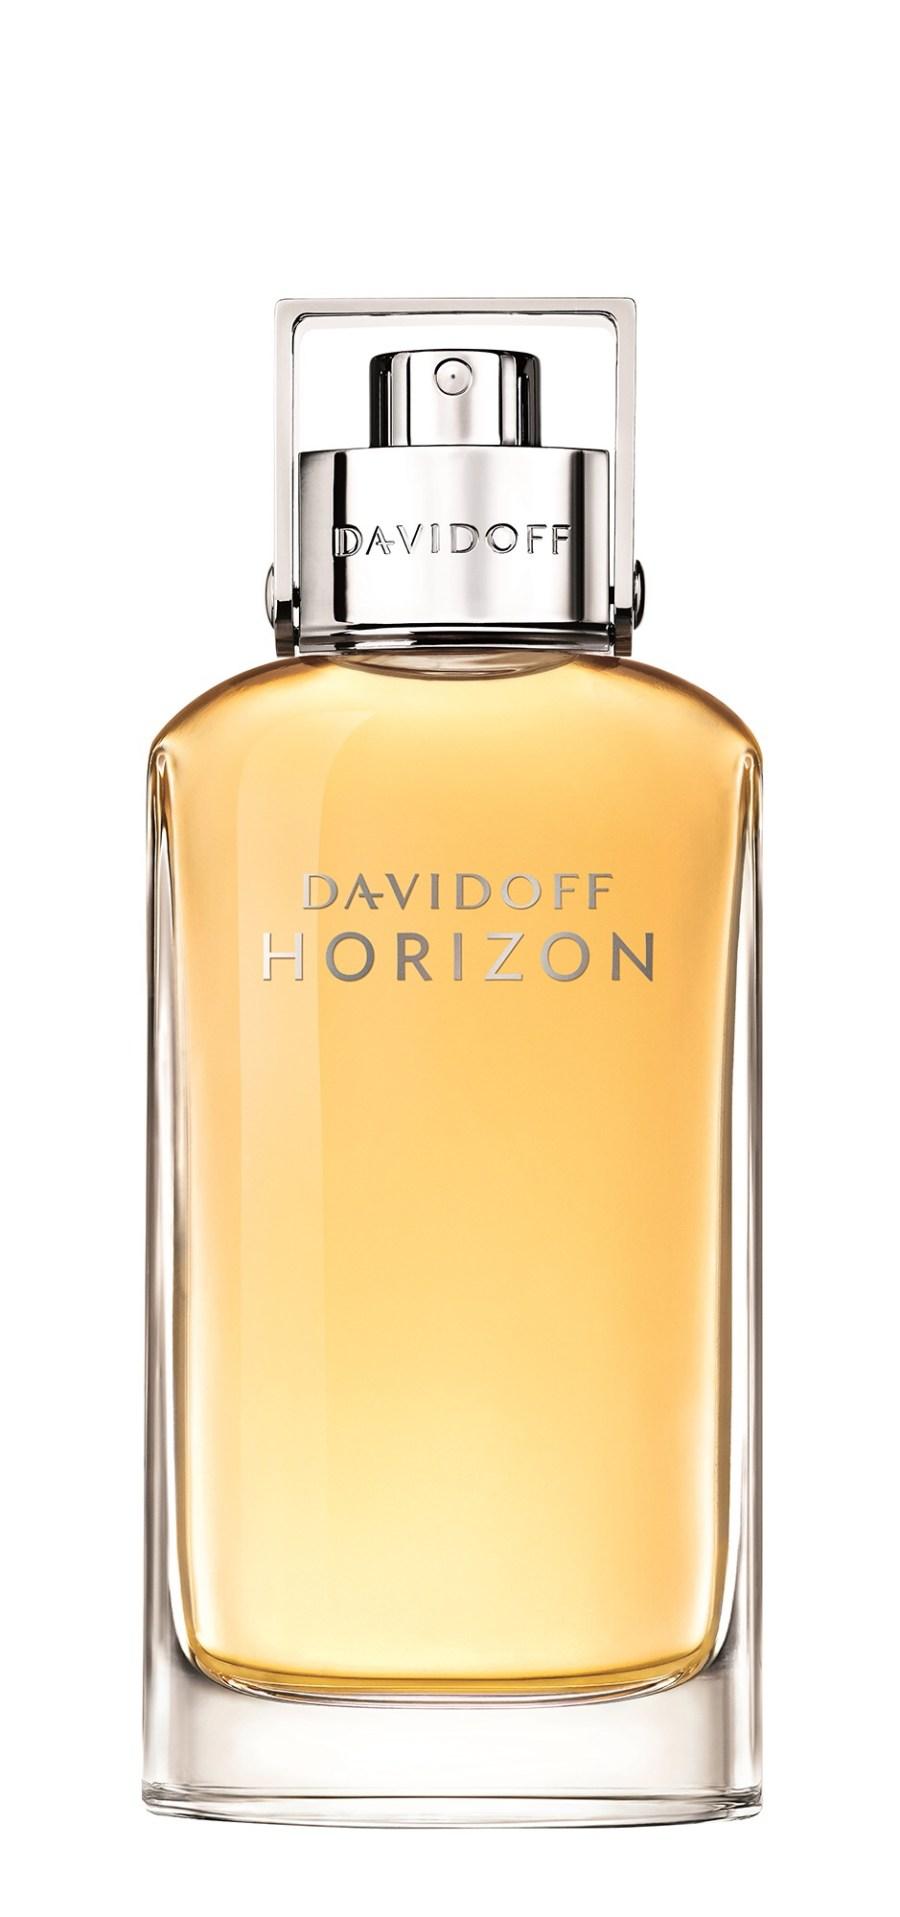 a tall glass fragrance bottle.